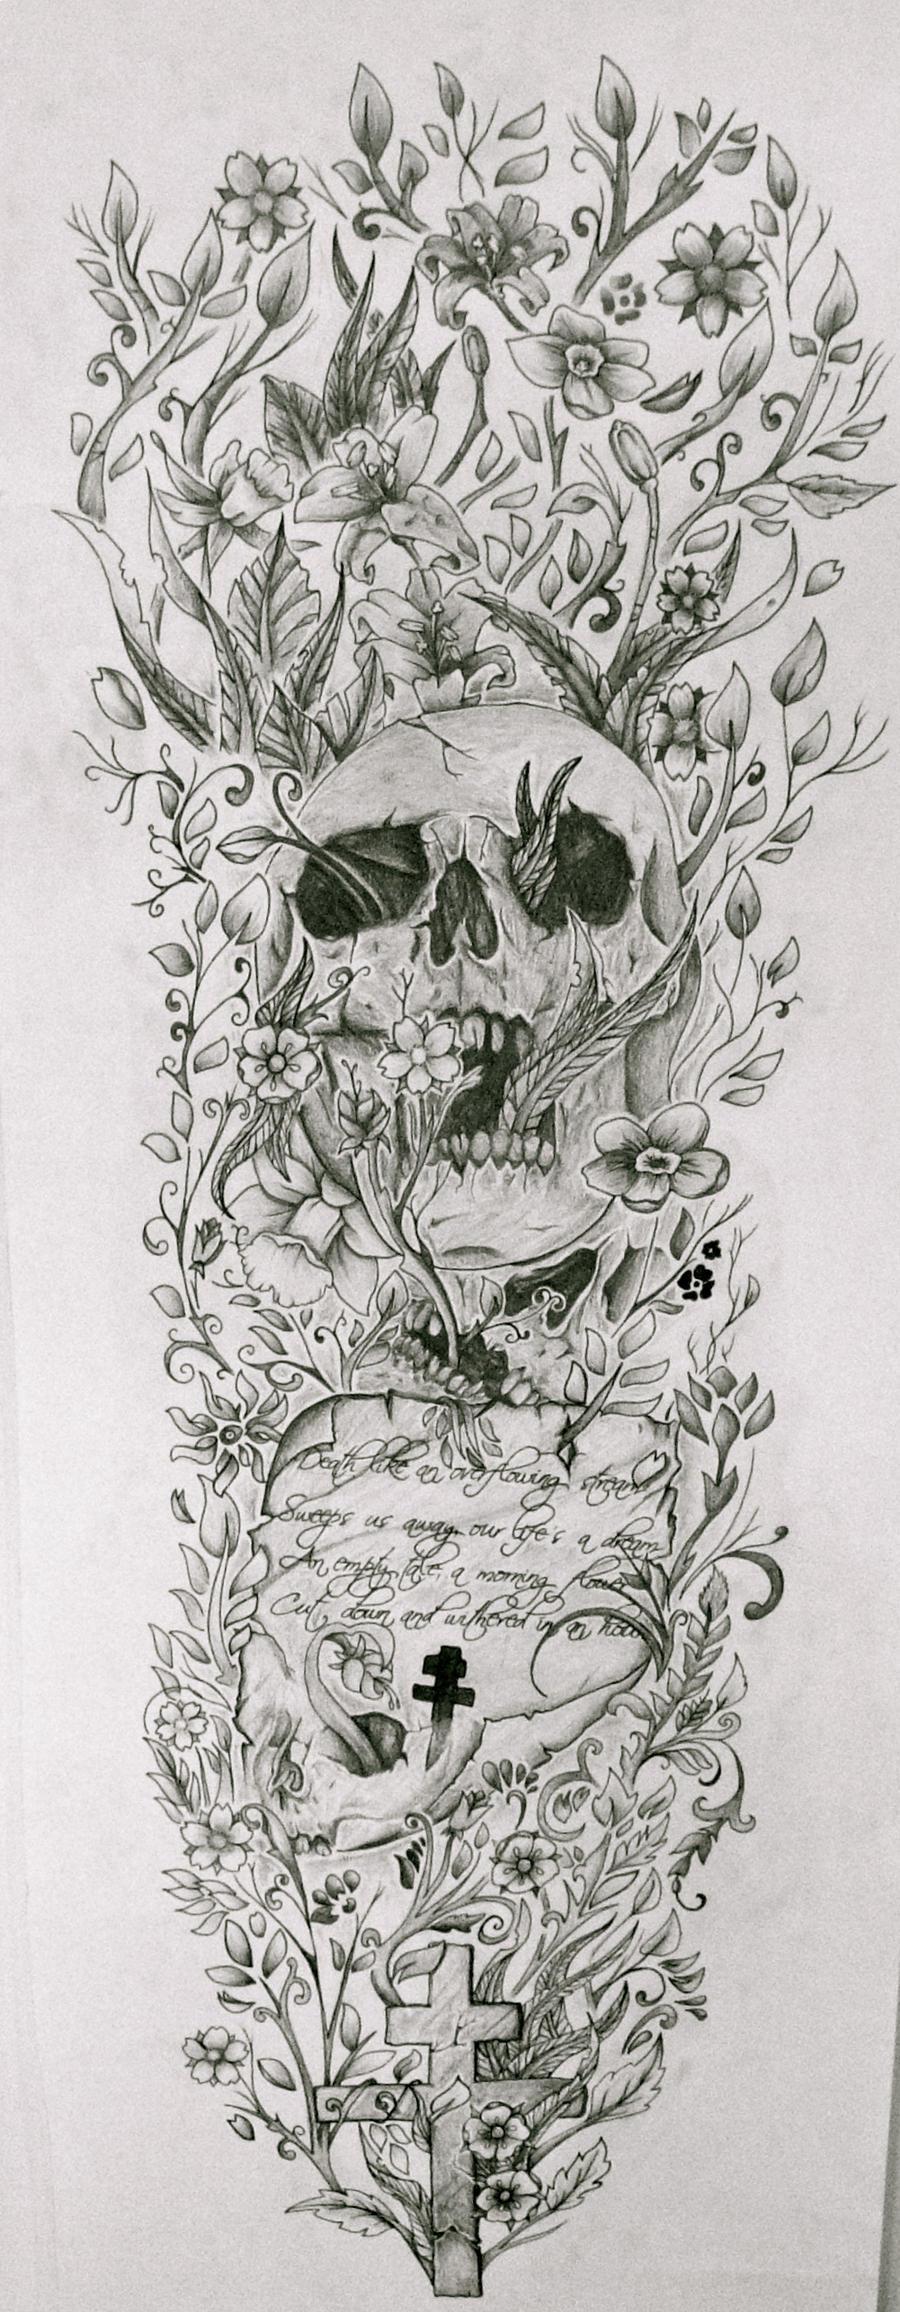 Full sleeve by josephblacktattoos on deviantart for Half sleeve tattoo sketches